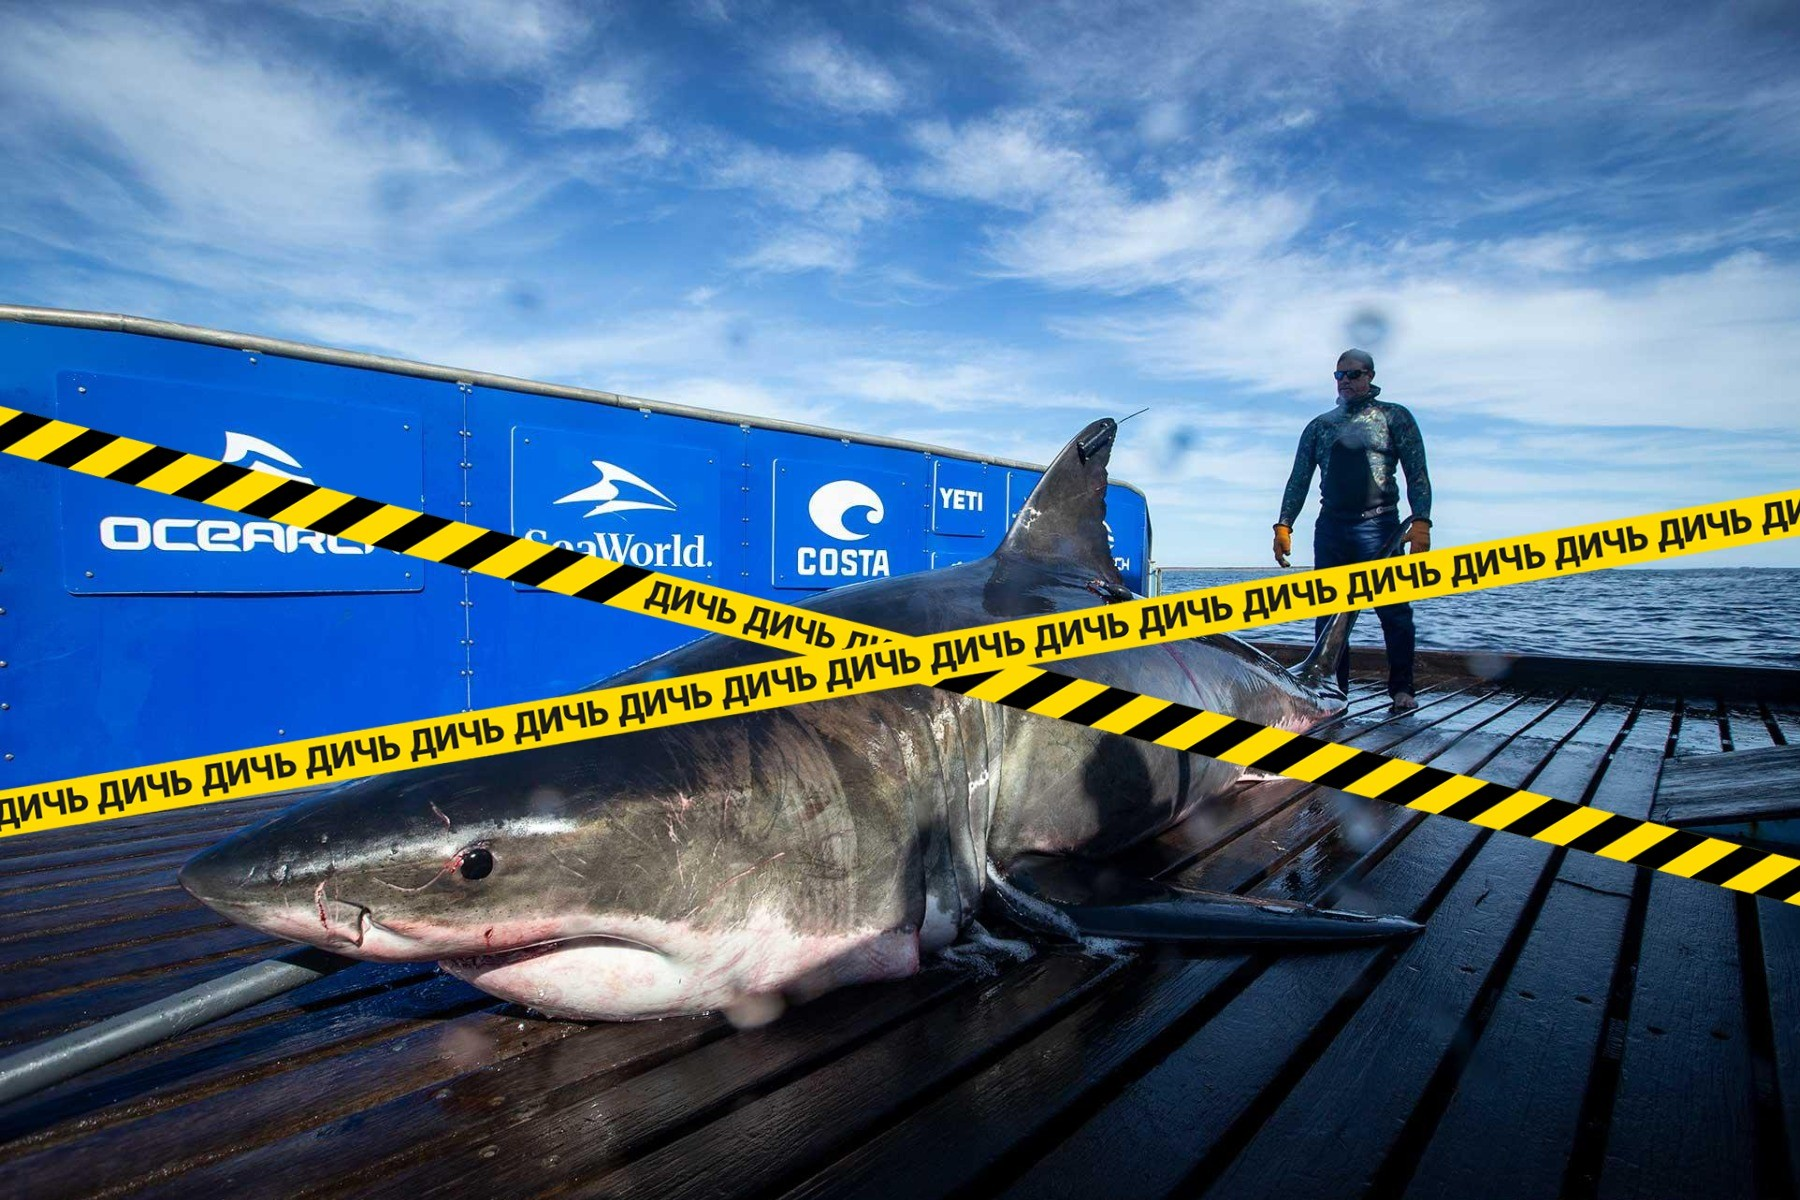 "<p>Фото © Twitter/<a href=""https://twitter.com/SharkMontauk/status/1179722016095703040/photo/3"" target=""_self"">SharkMontauk</a></p>"